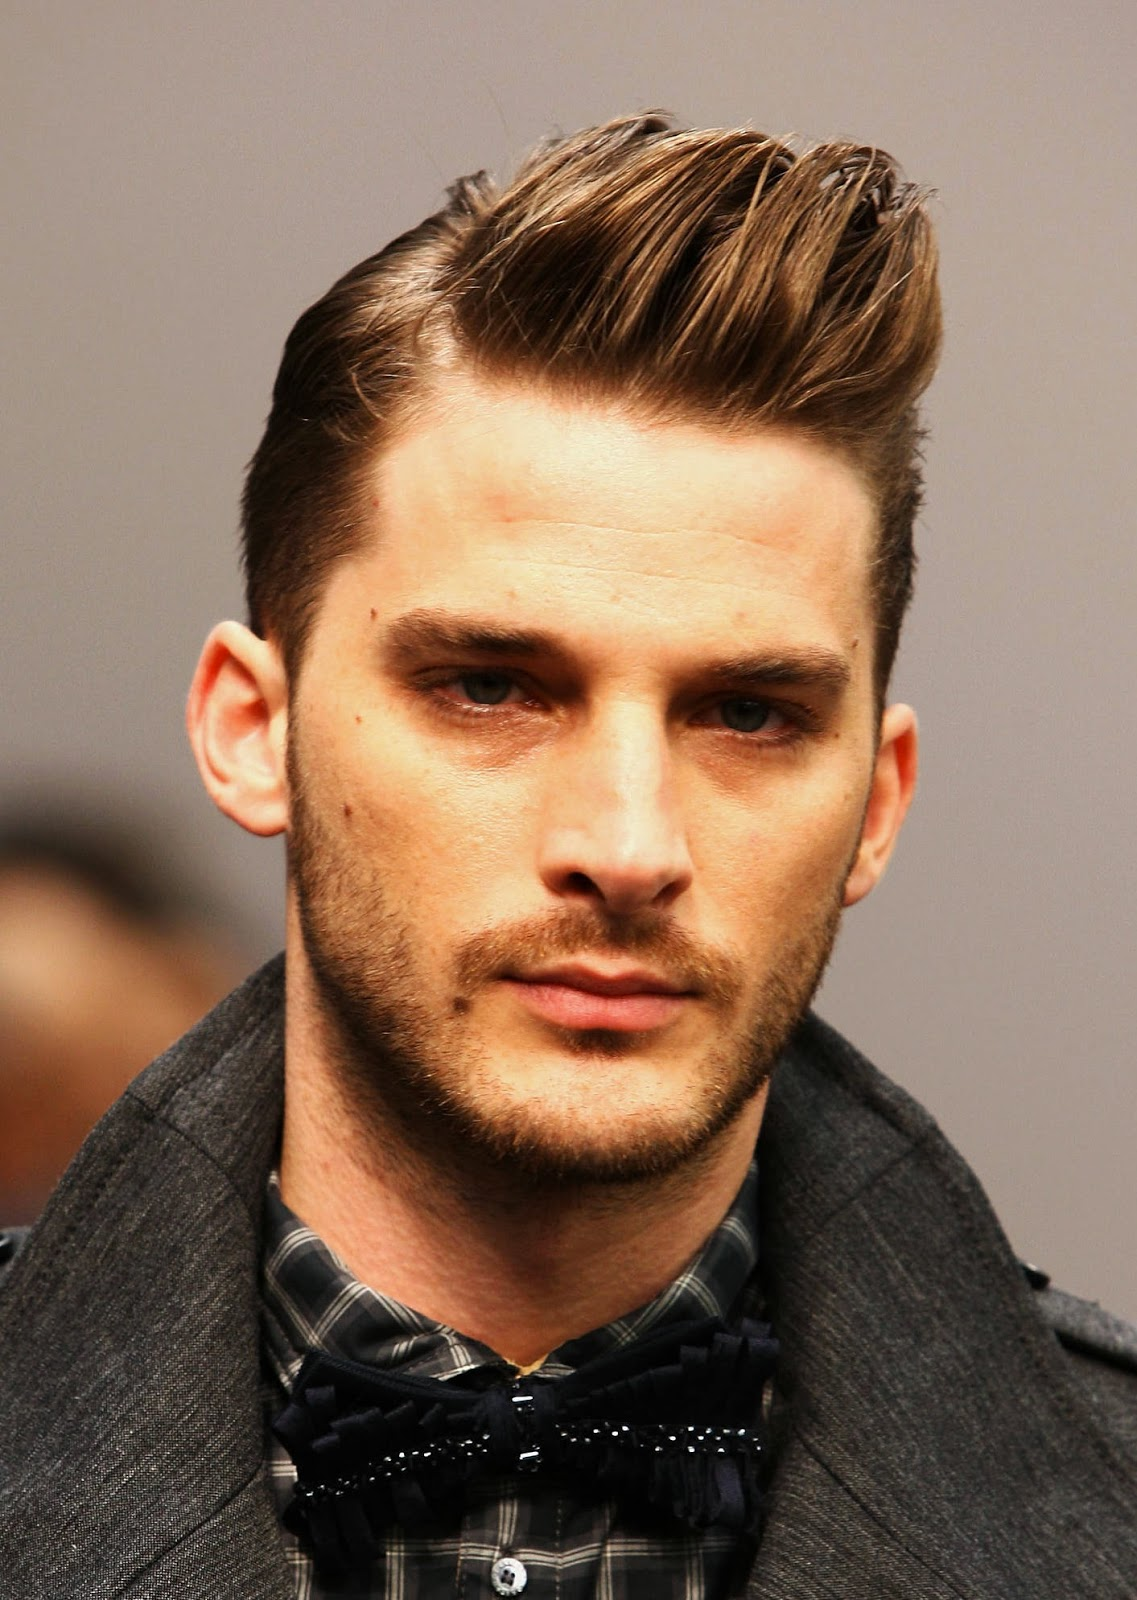 Different Hairstyles Men 2013